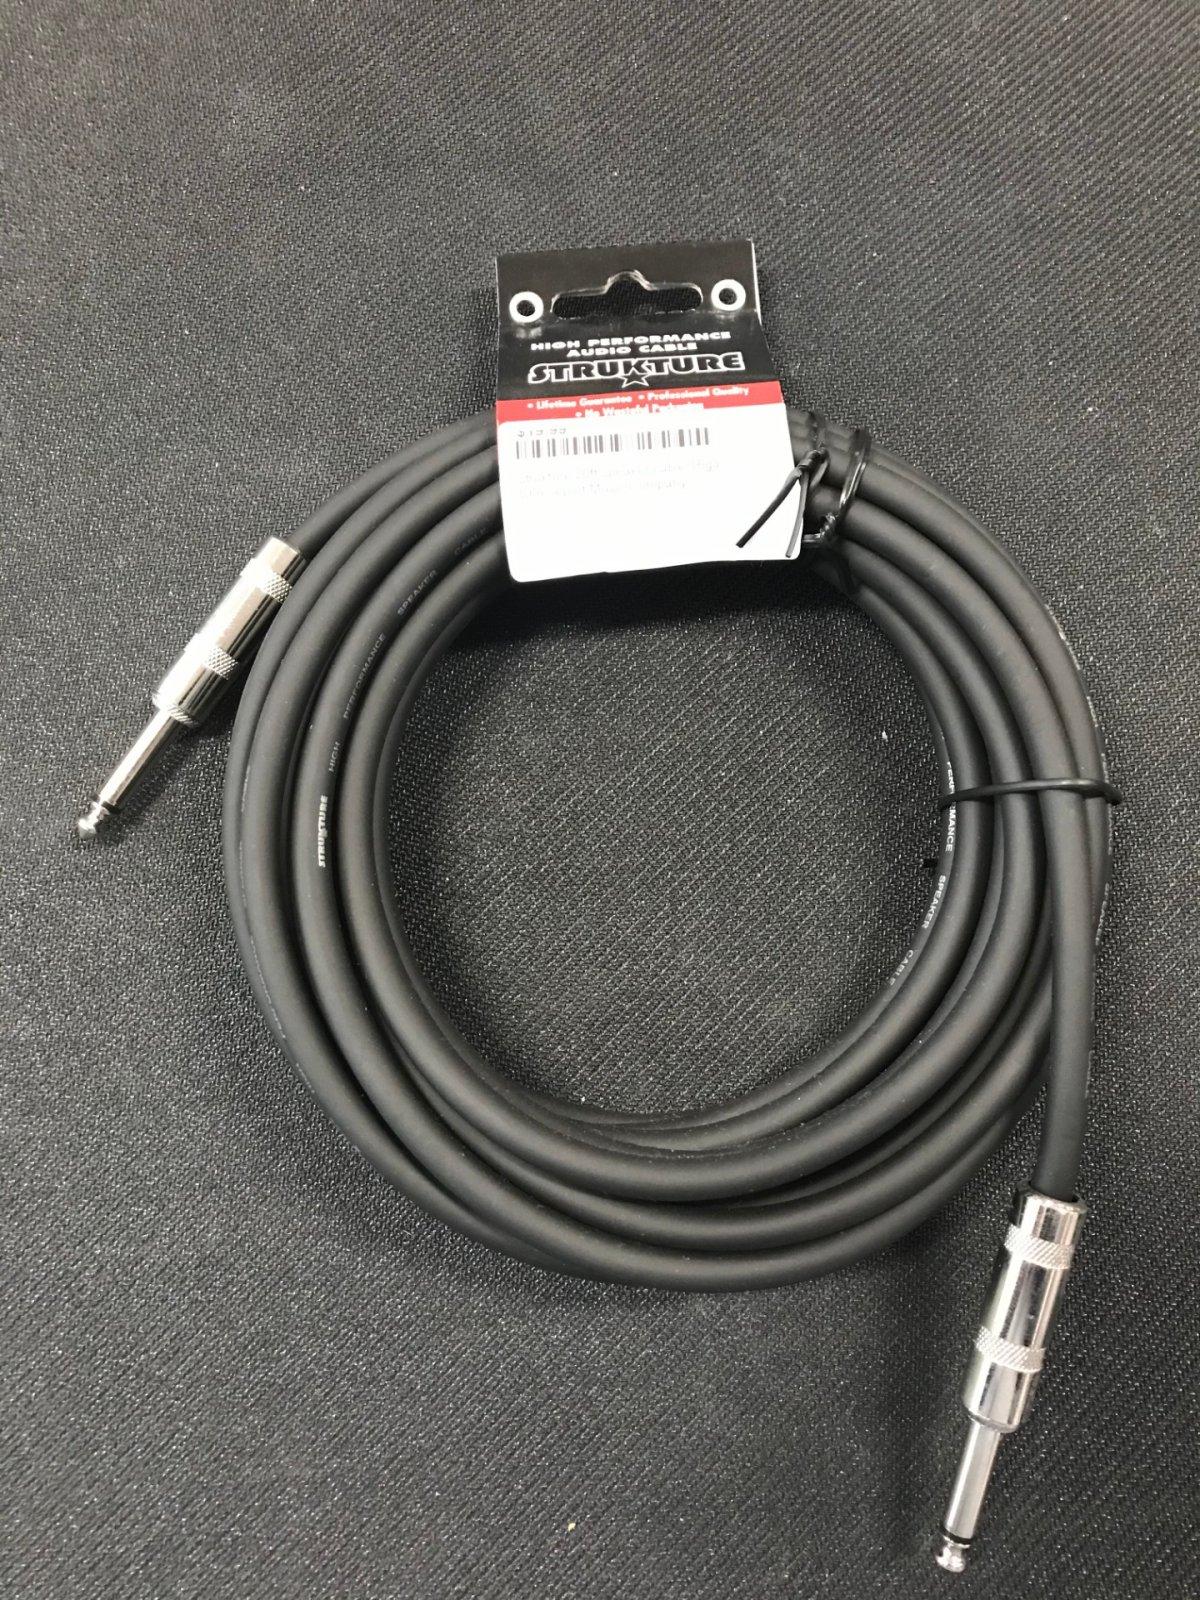 strukture 20ft speaker cable 16ga